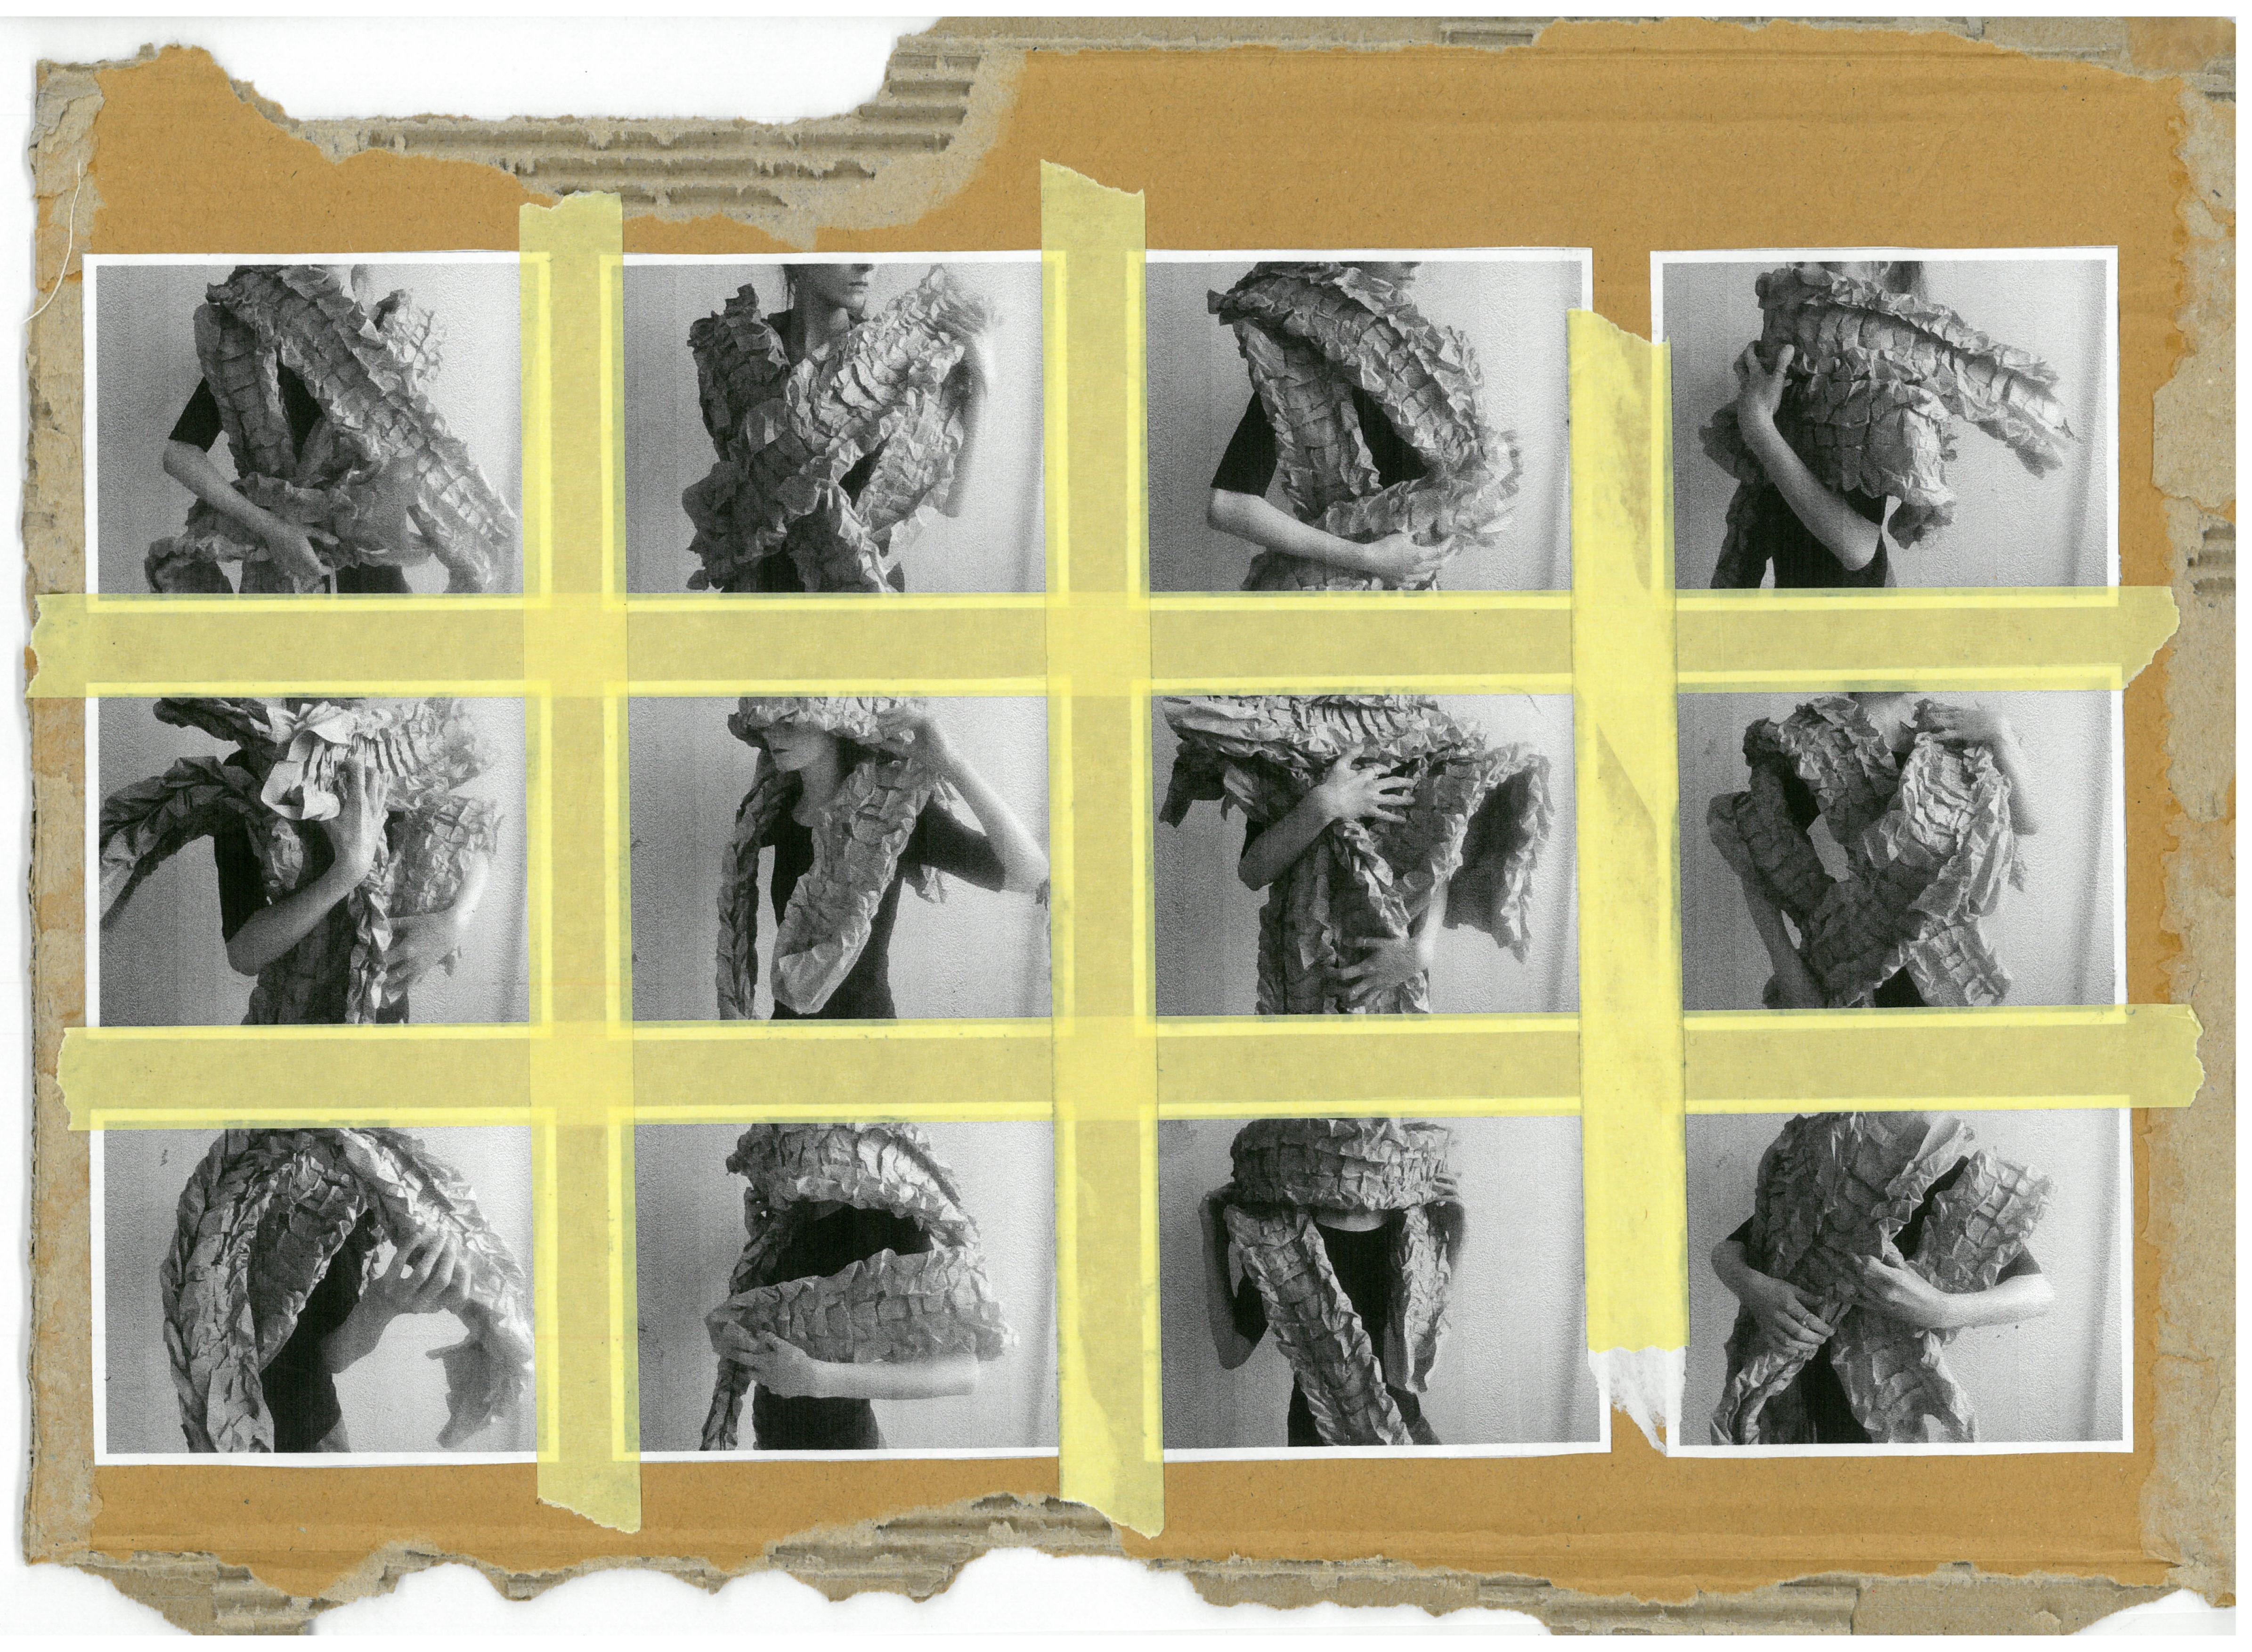 reptilian_days